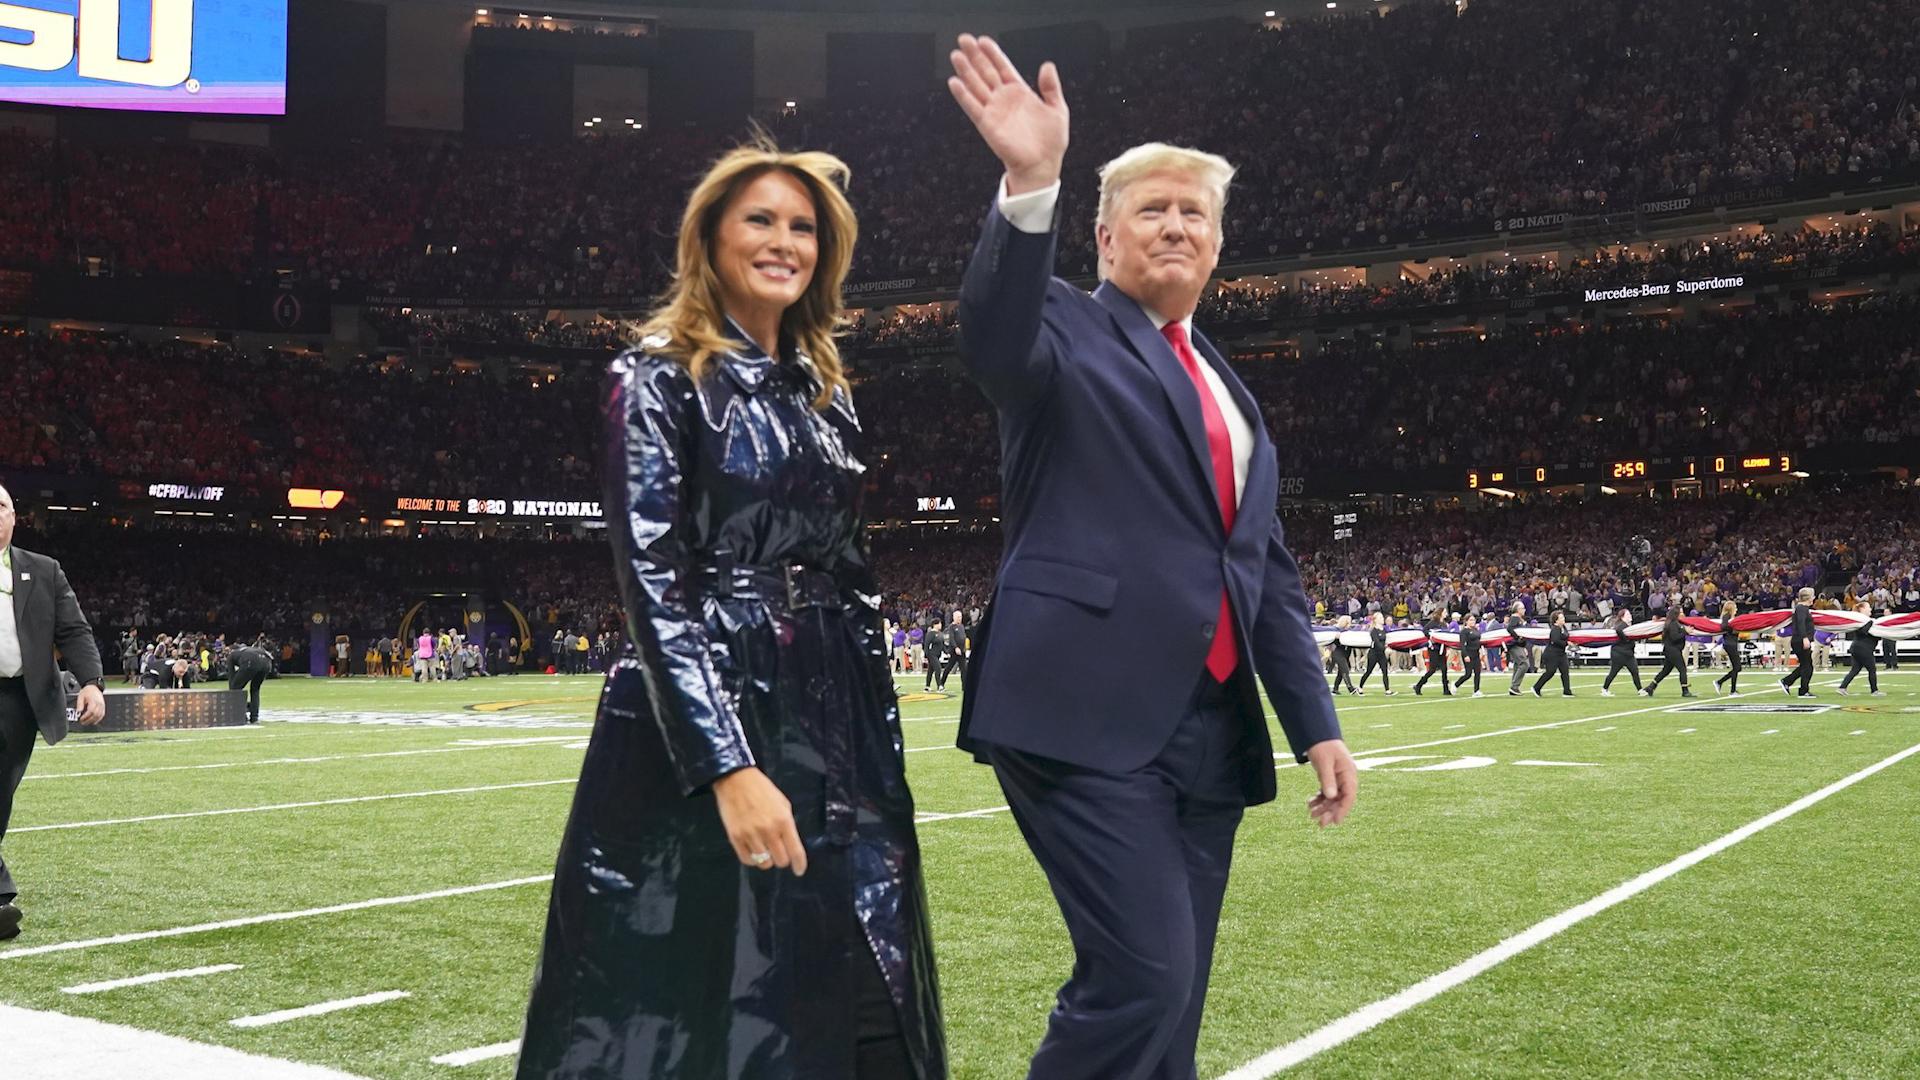 President Trump US Secret Service NOLA LSU vs CLEMSON CFP Championship Game coin